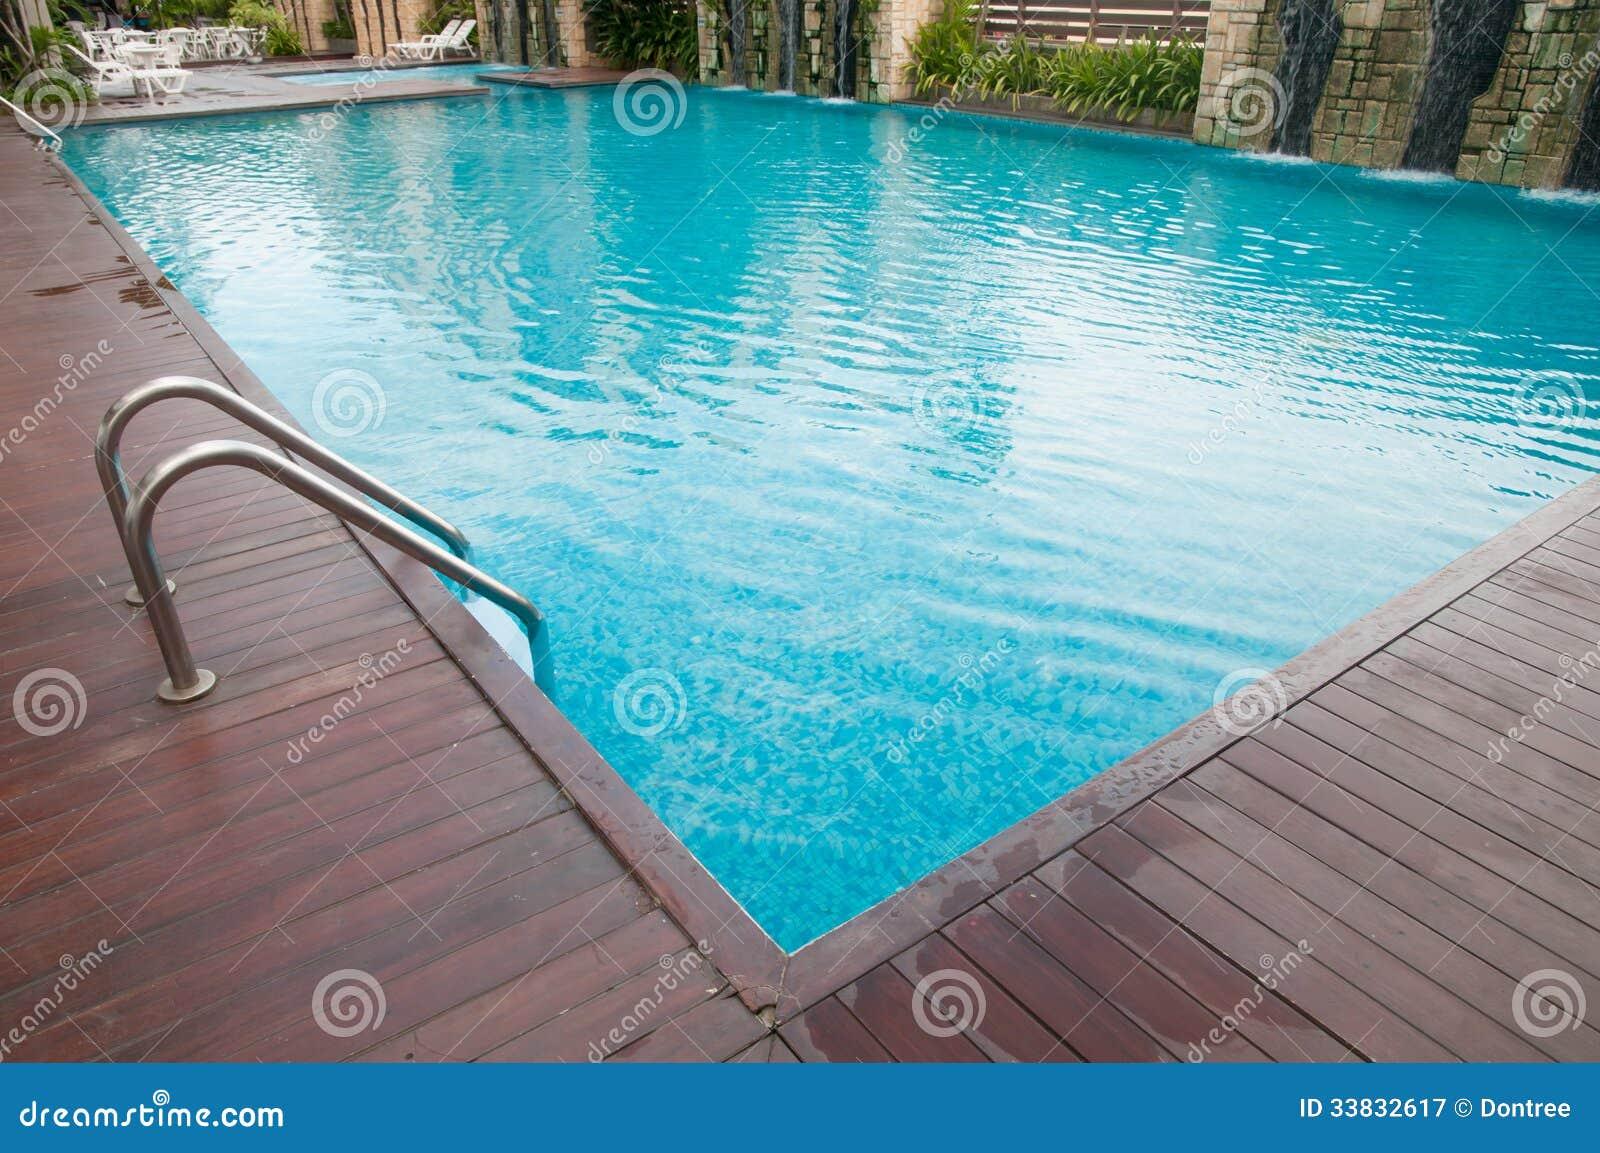 Swimming pool lane lines background Underwater Pool Indoor Swimming Pool With Lane Lines And Backstroke Flags Swimming Pool Lane Lines Background